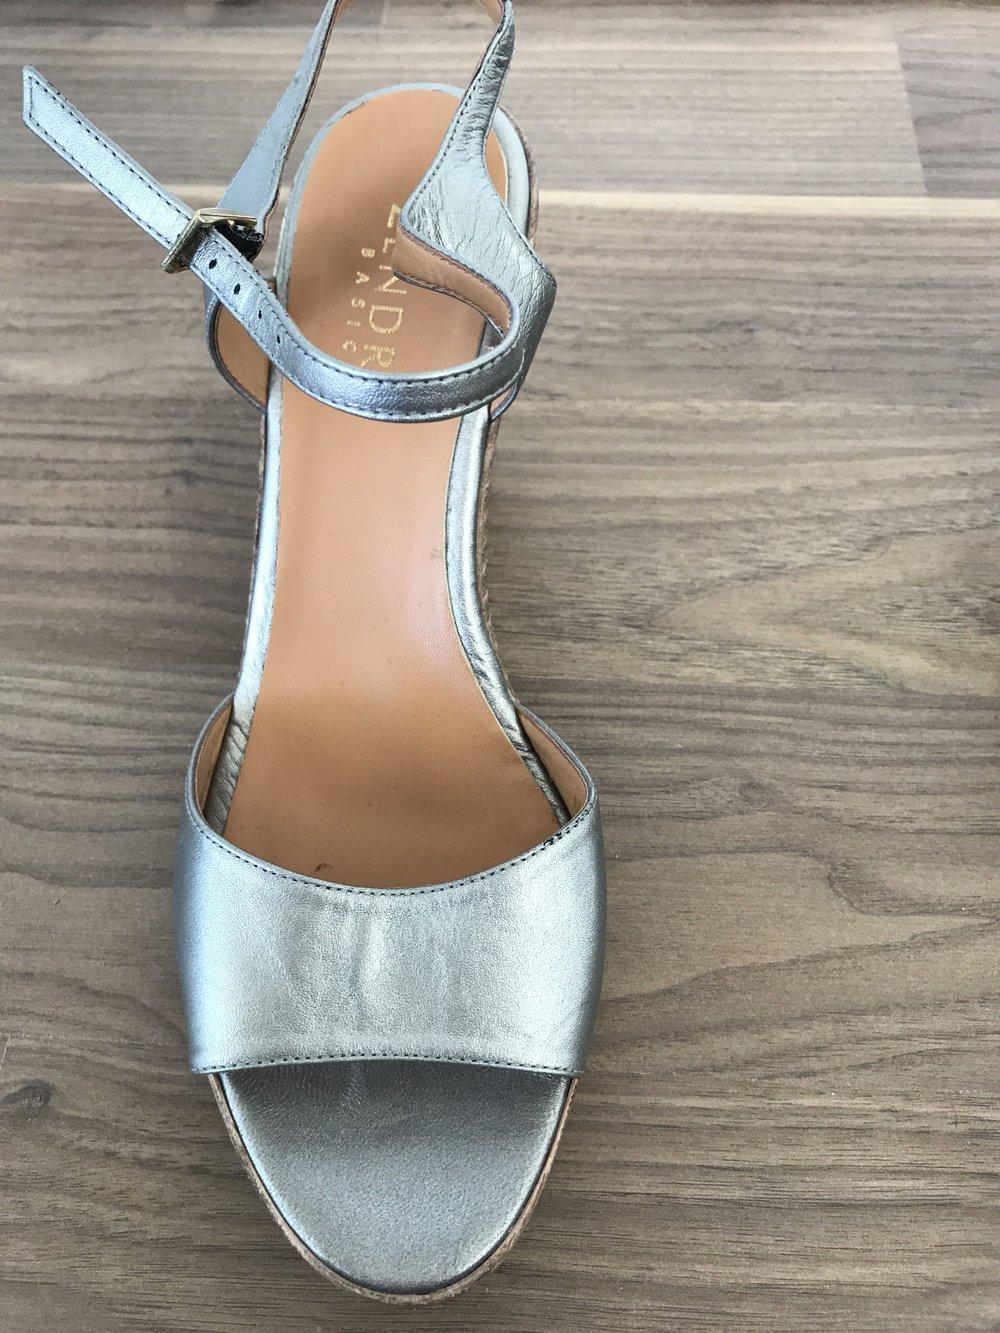 40 Silber Sandaletten Keilabsatz Leder Neu Damen eBoWdCQrx